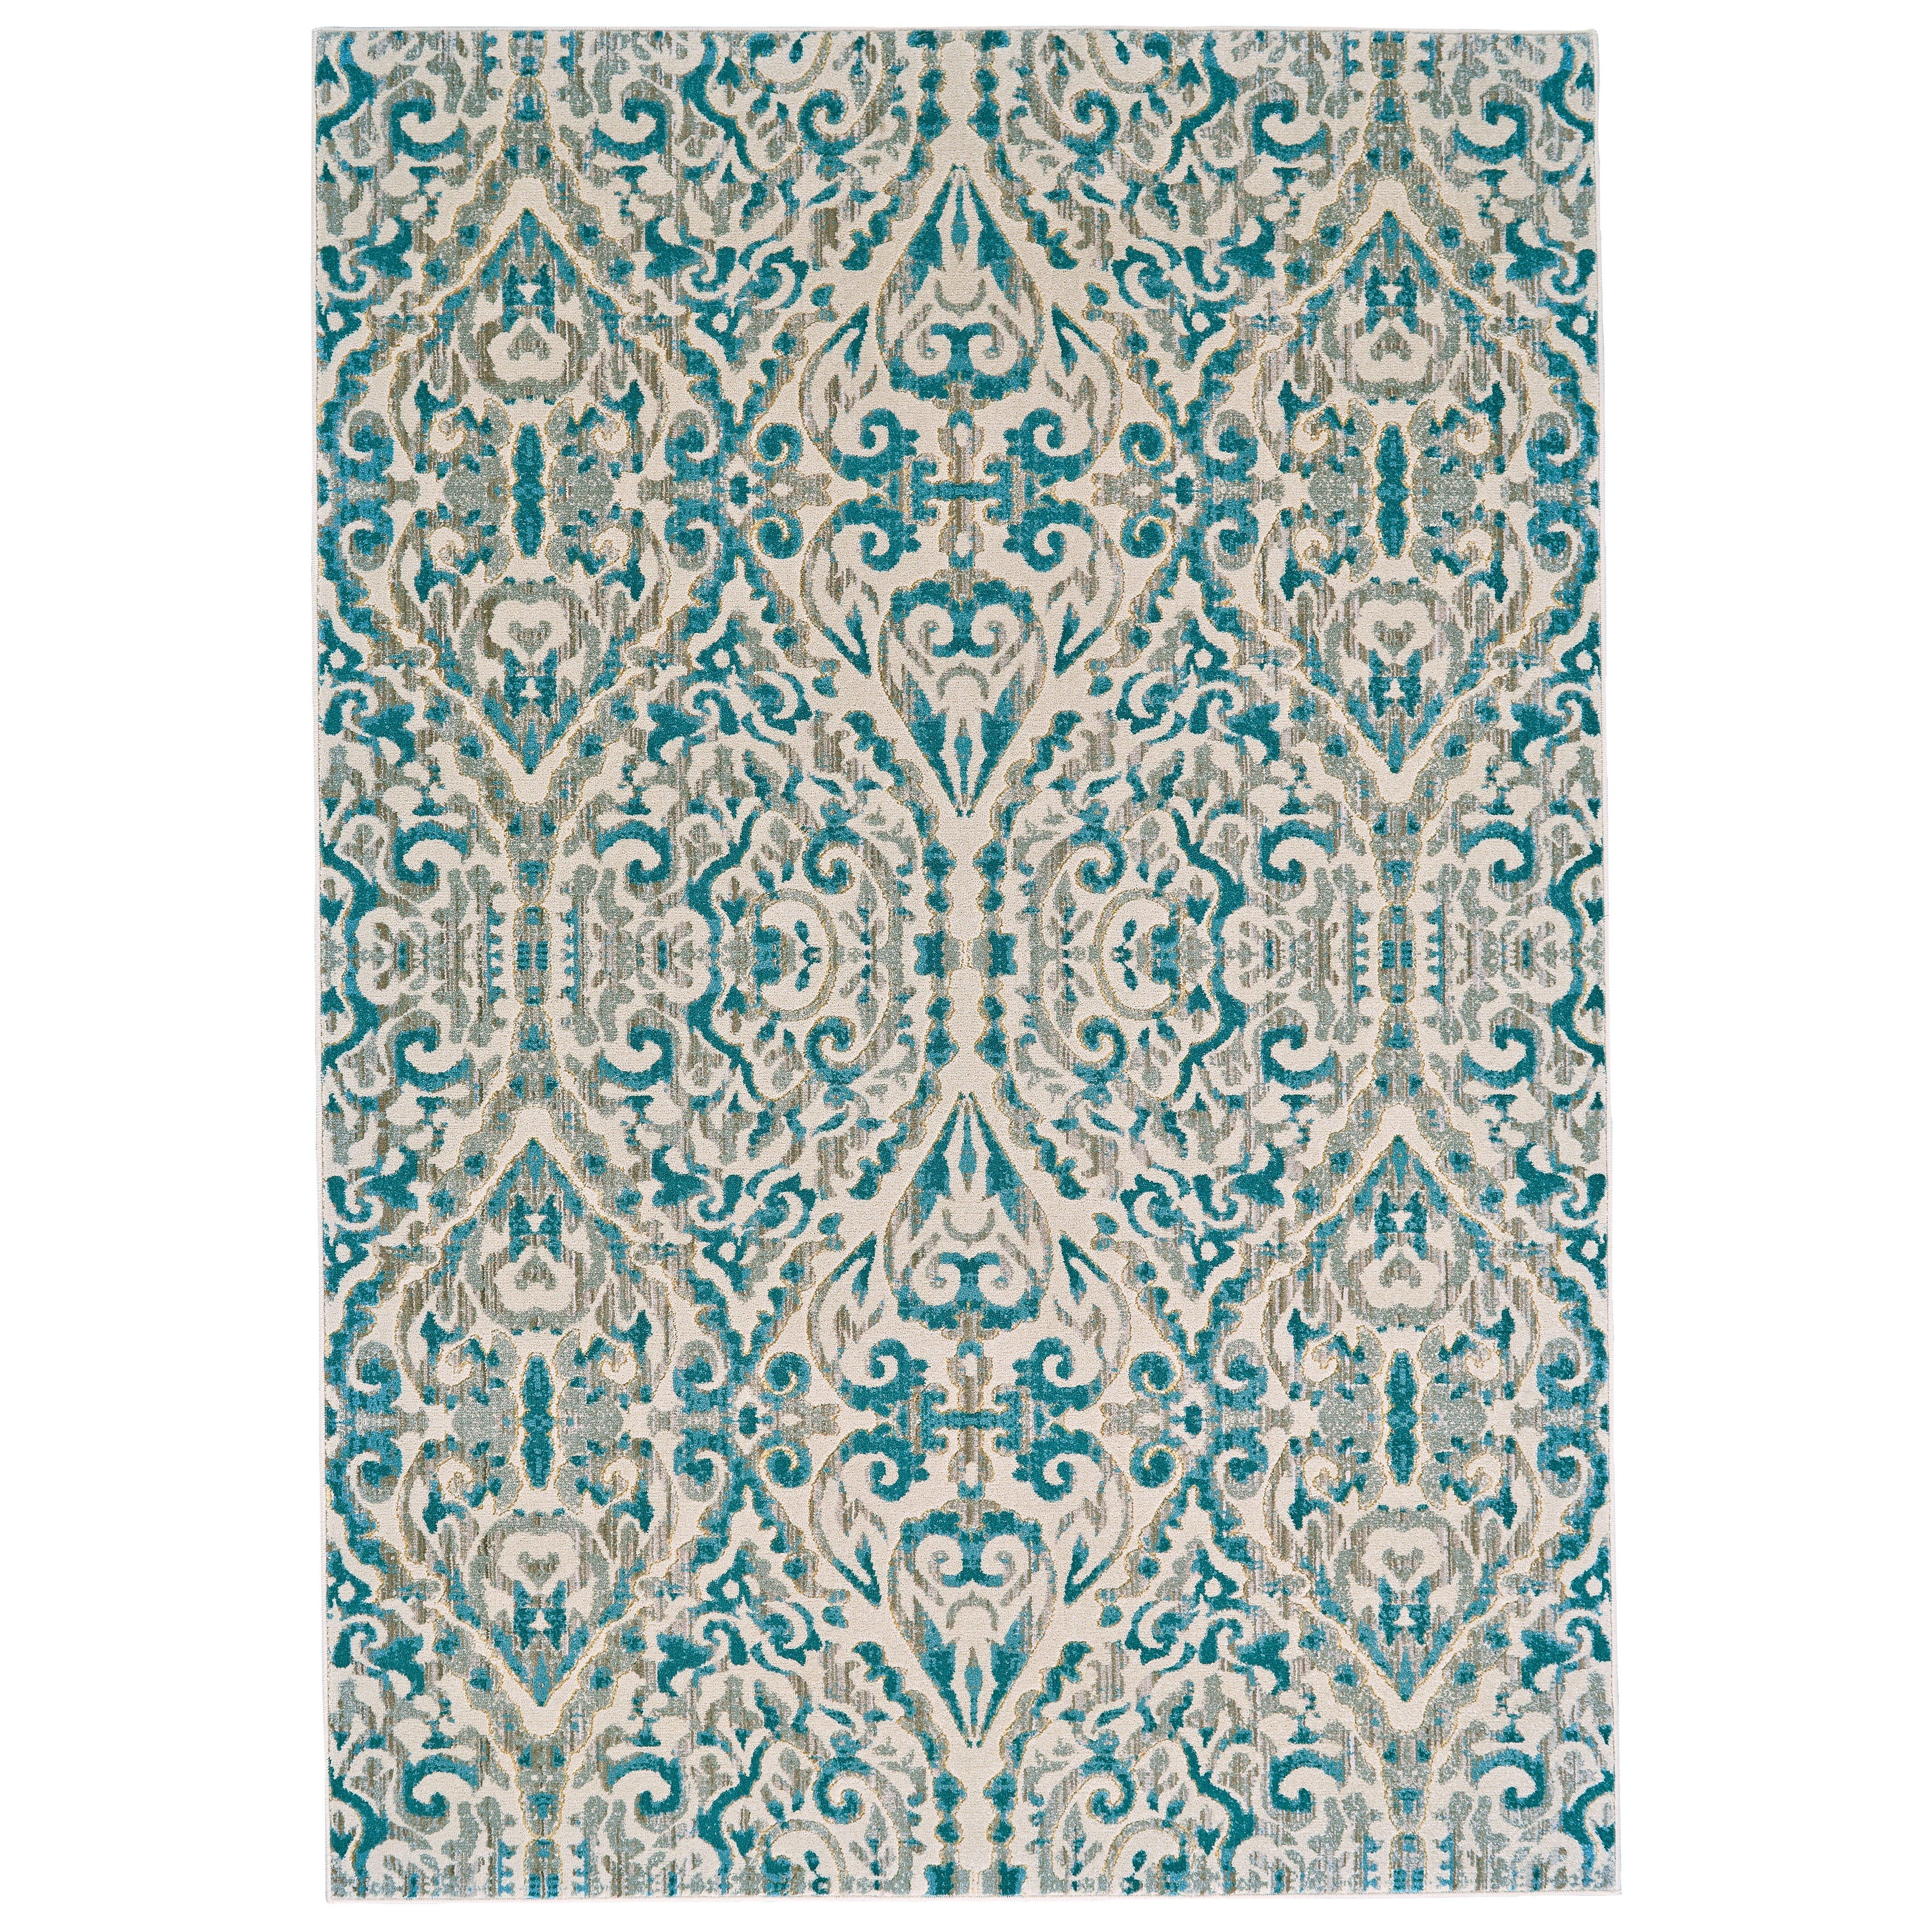 Bungalow rose saleya turquoise area rug reviews wayfair for Turquoise area rug